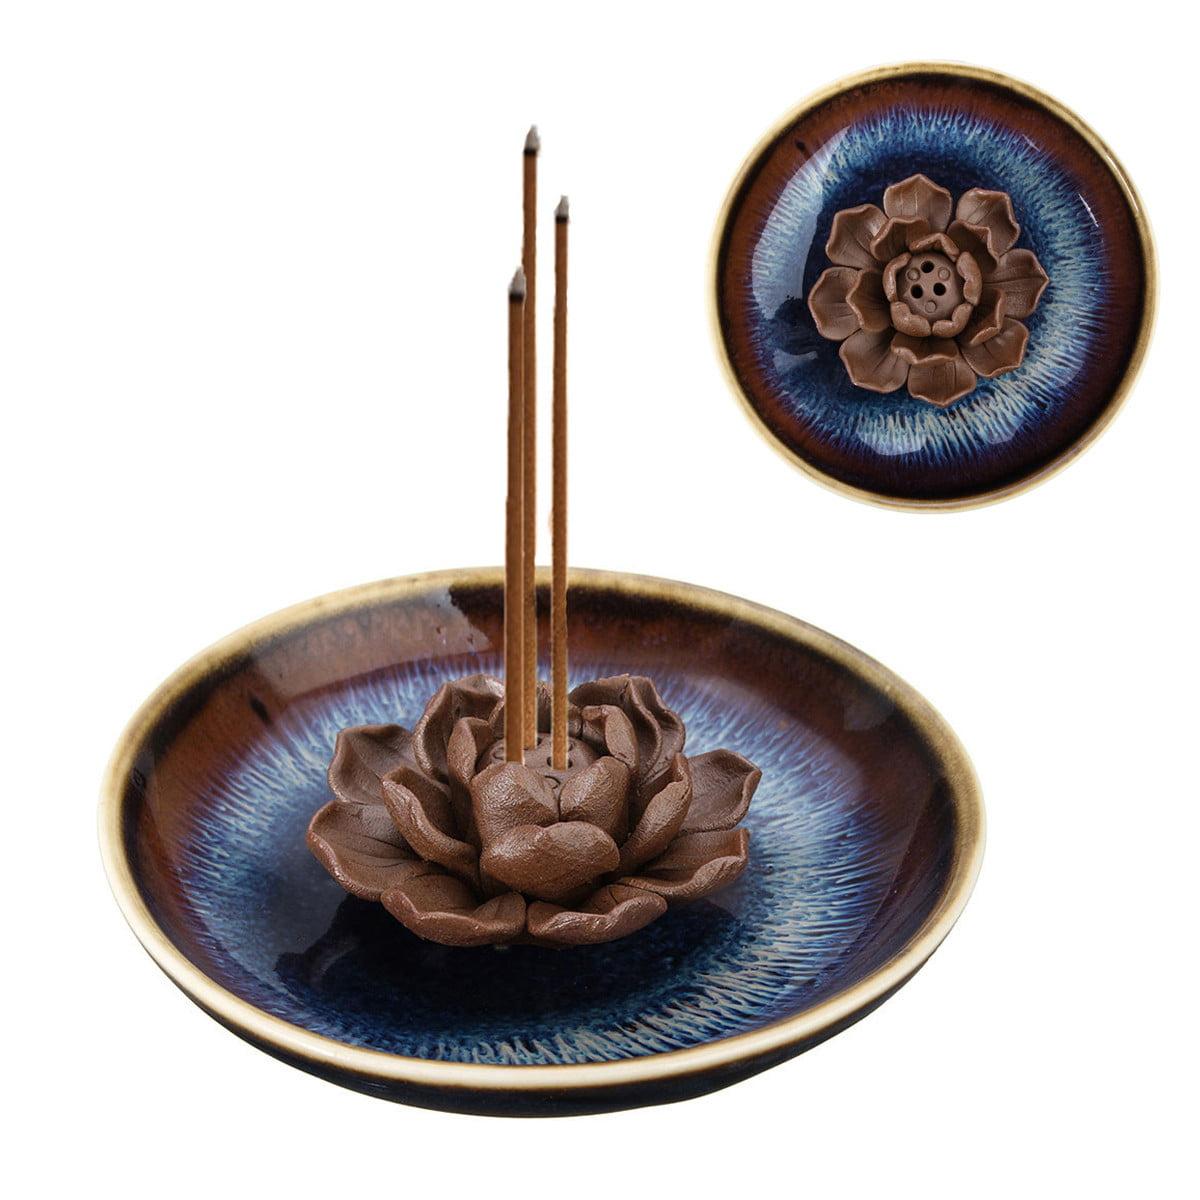 9 Holes Lotus Incense Burner Holder Flower Statue Censer Plate For Sticks /& Cone